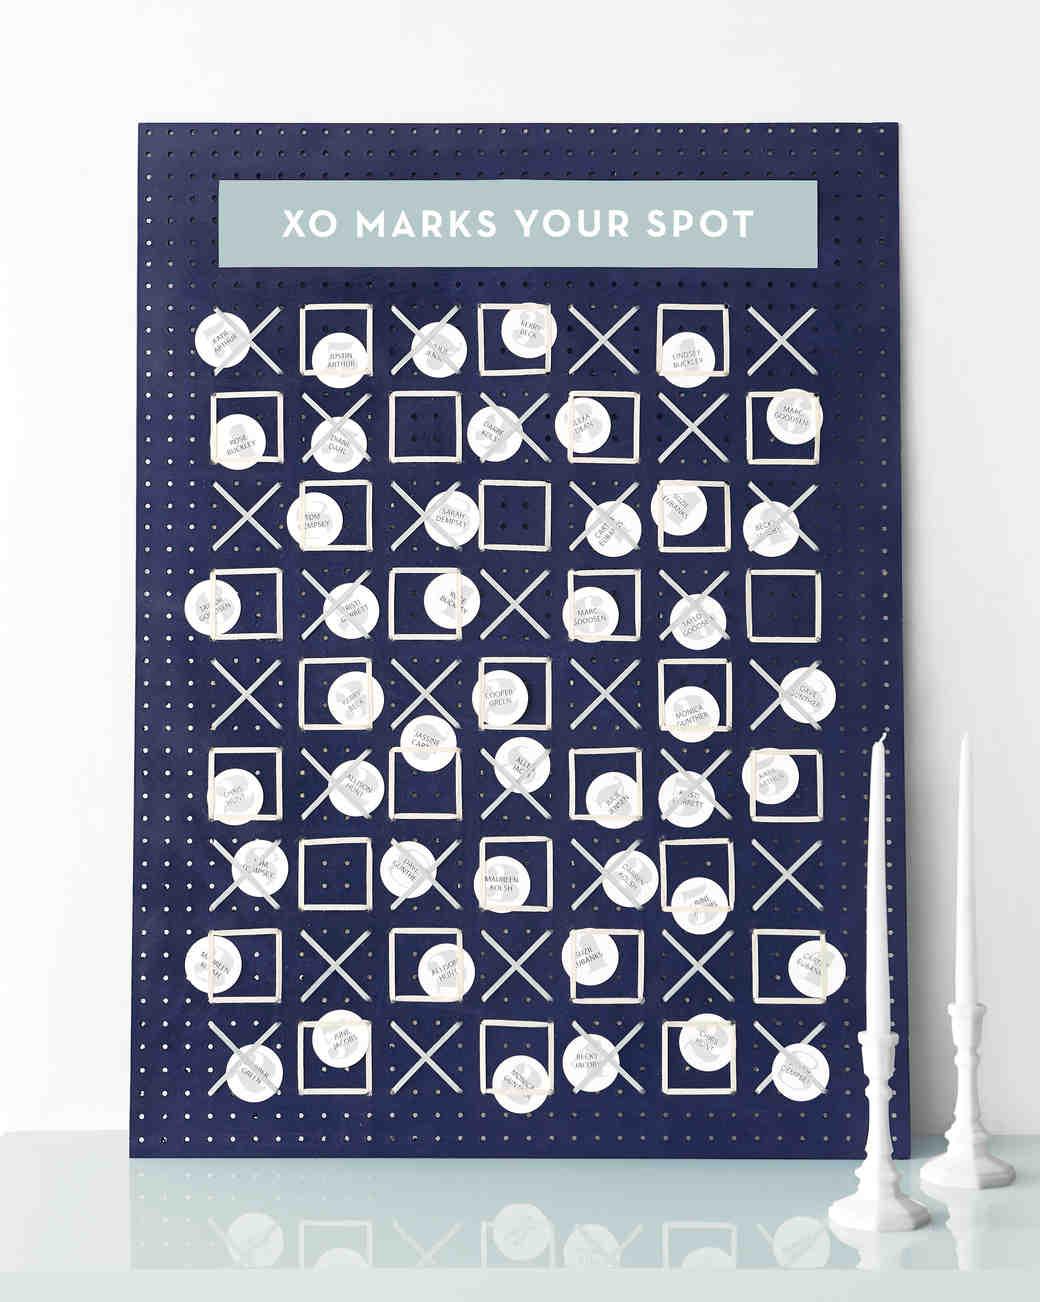 A Creative Escort Card Display Idea: XO Marks Your Spot